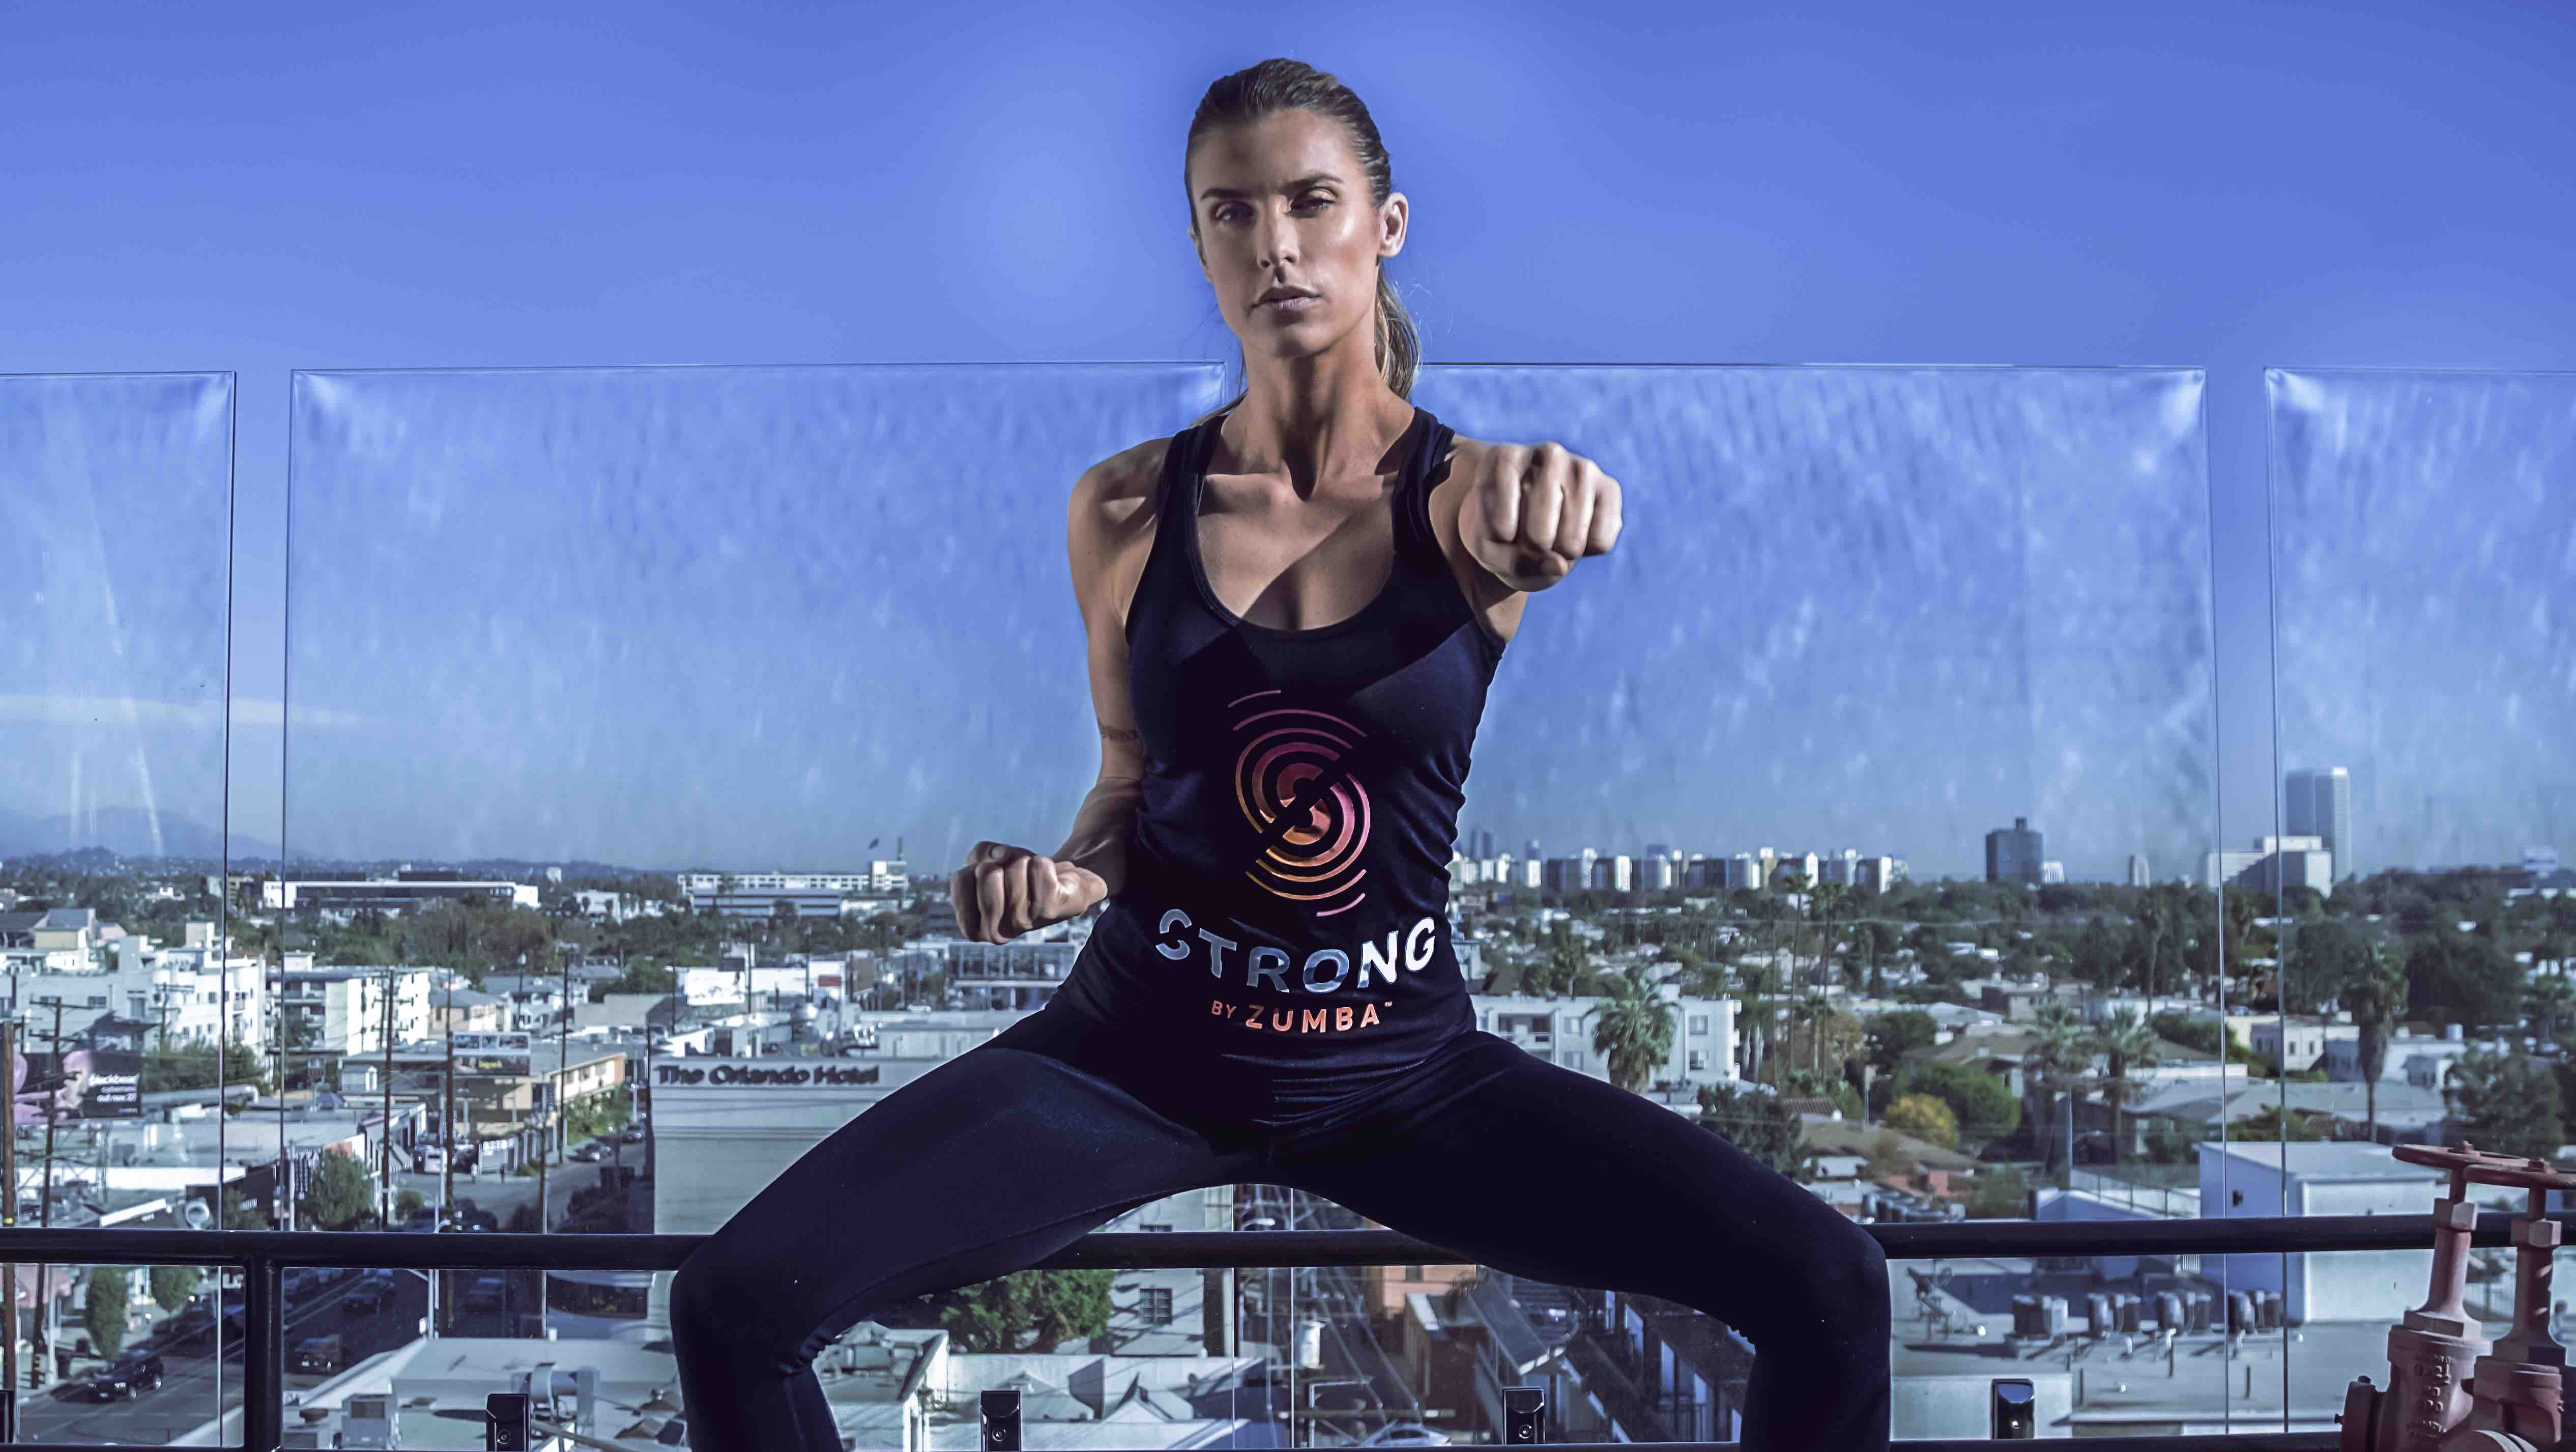 Elisabetta Canalis si allena con STRONG by Zumba